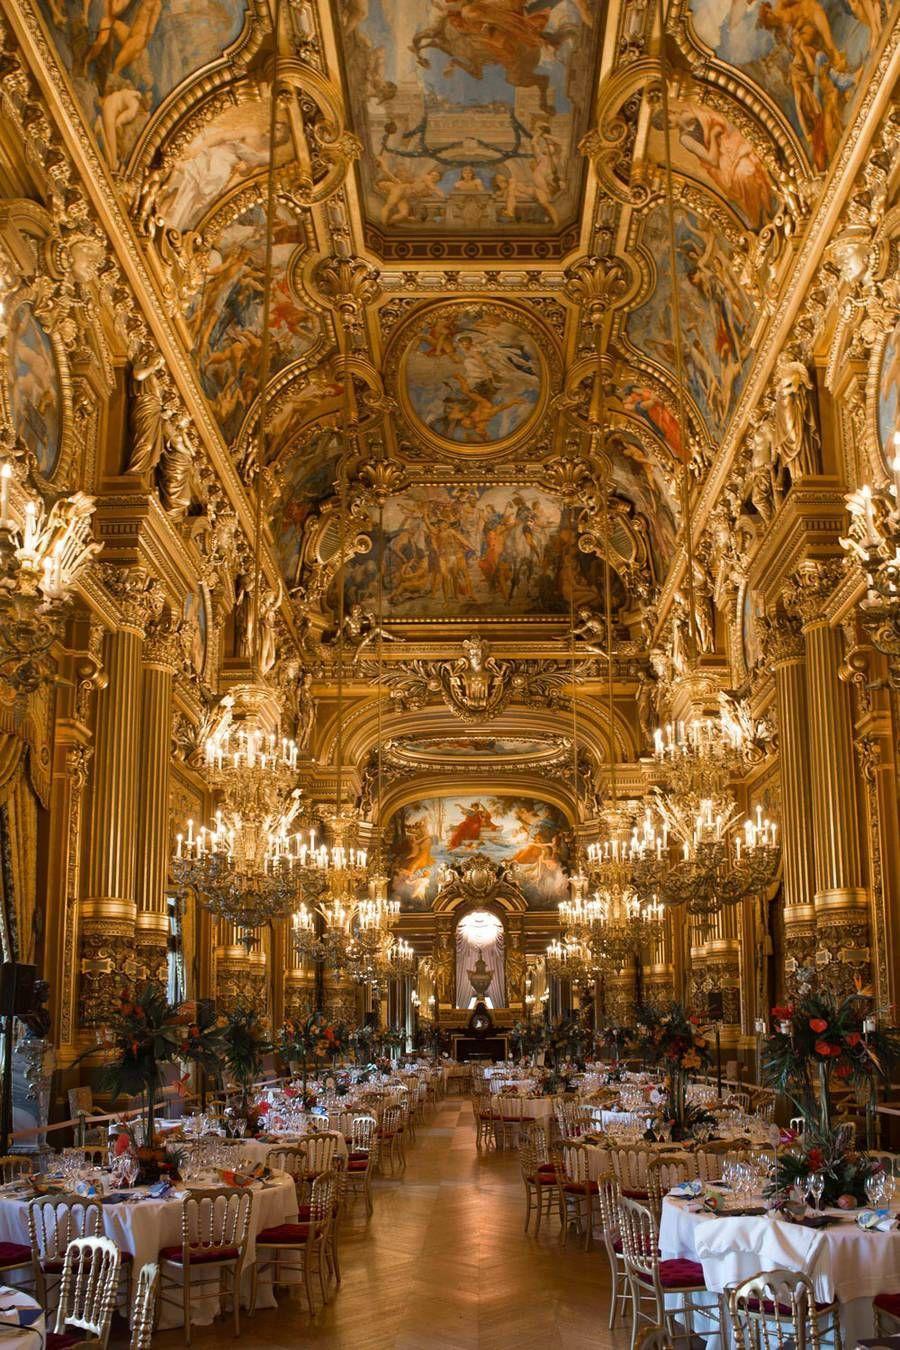 Opera De Paris Opening Gala For Season 16 17 Barock Architektur Schone Gebaude Architektur